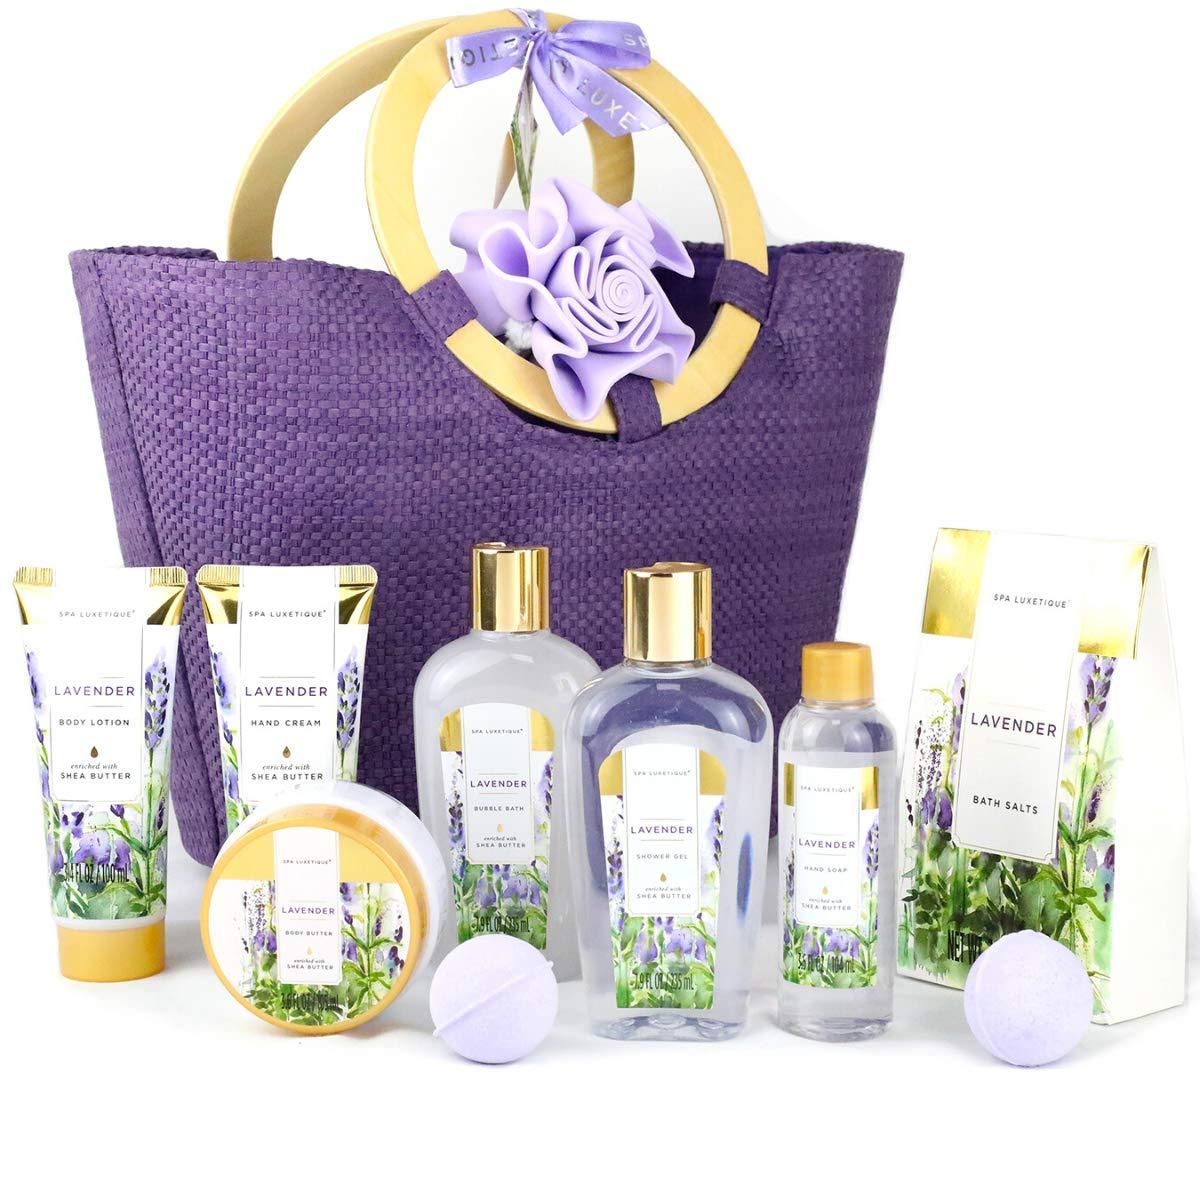 Spa Luxetique Spa Gift Set 10pcs Lavender Bath Set Luxury Bath Gift Set With Shower Gel